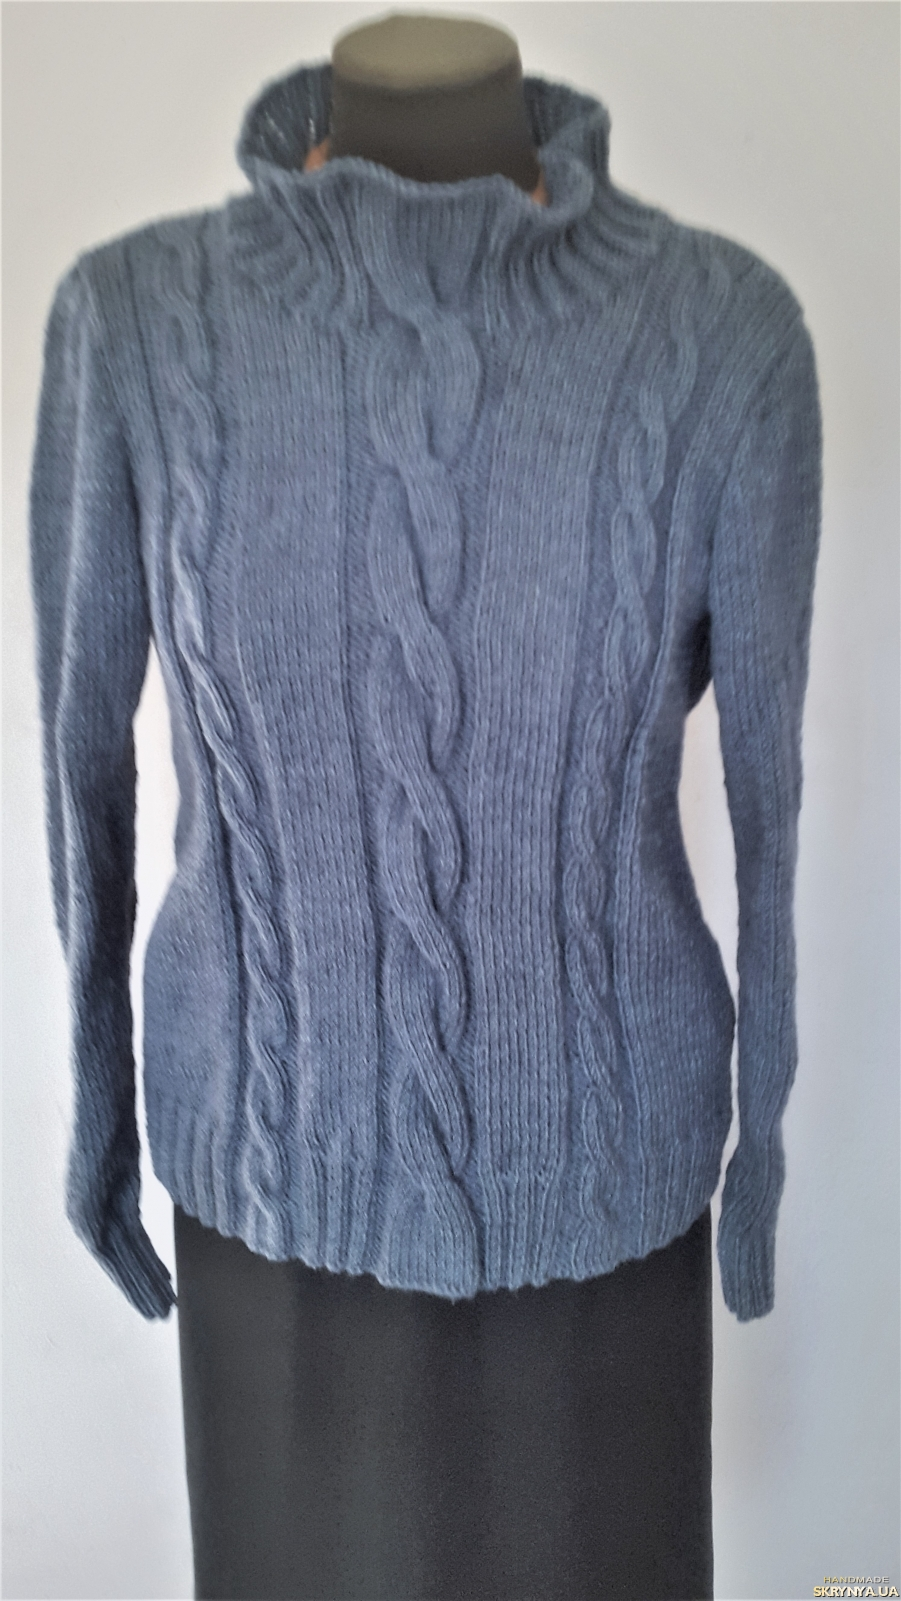 pictured here Теплый, женский свитер в стиле MAX MARA сине-серого цвета, 48-50 р.